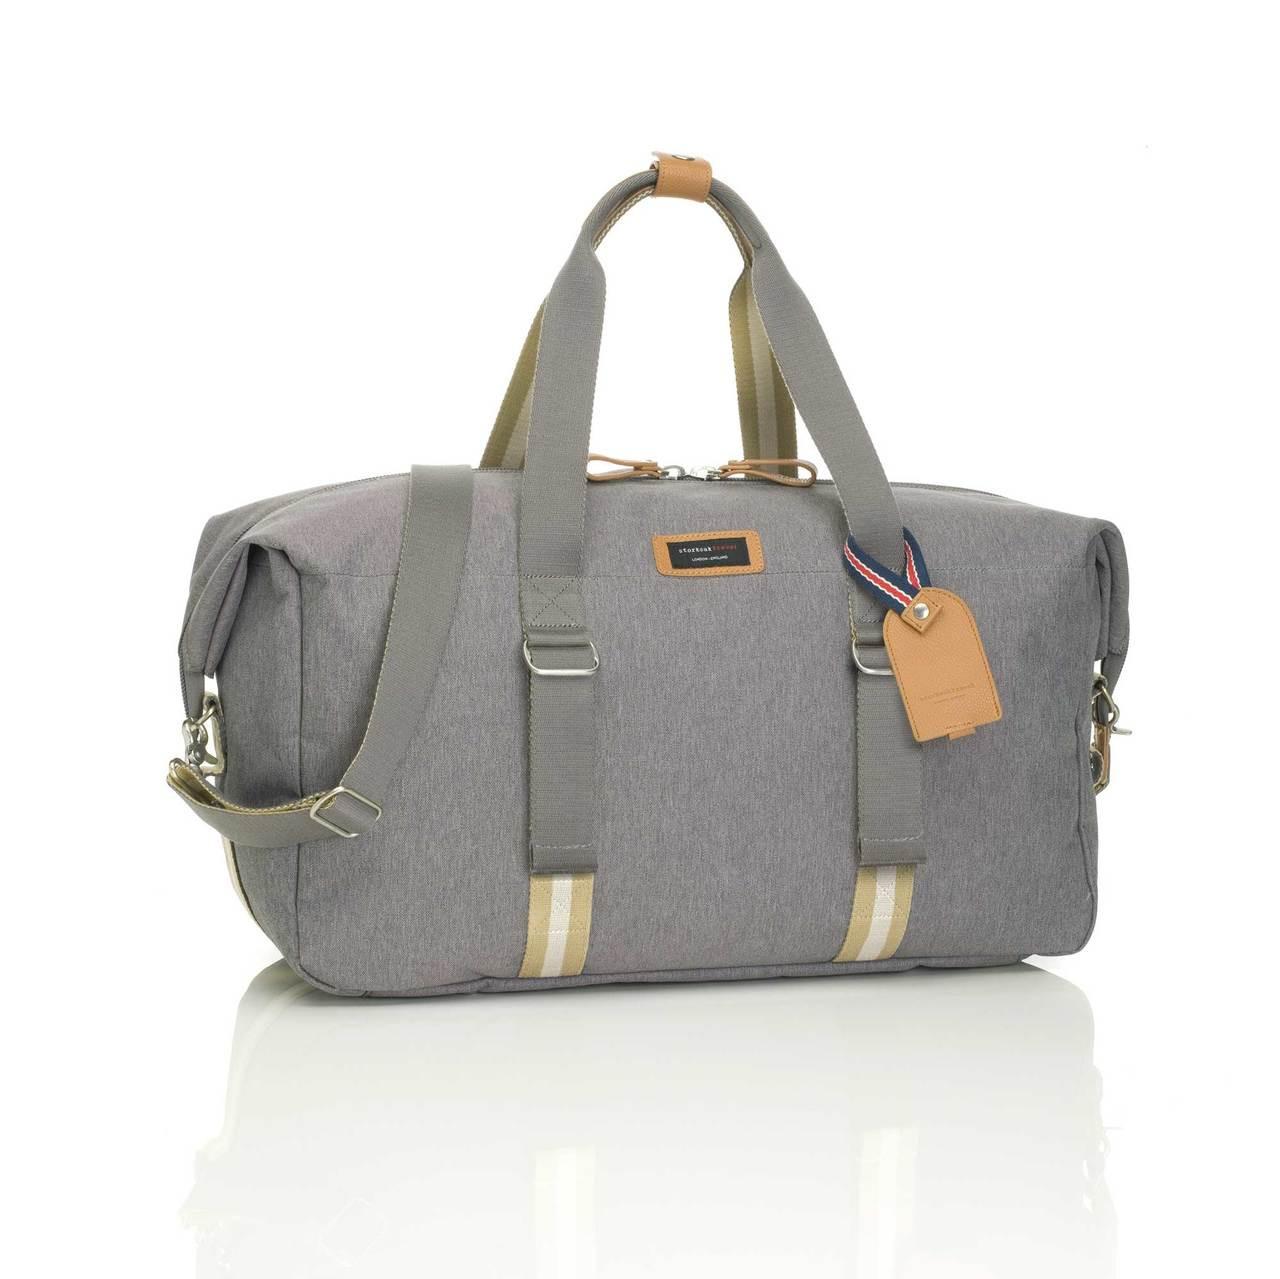 Storksak Travel Duffle Bag / Hospital Bag